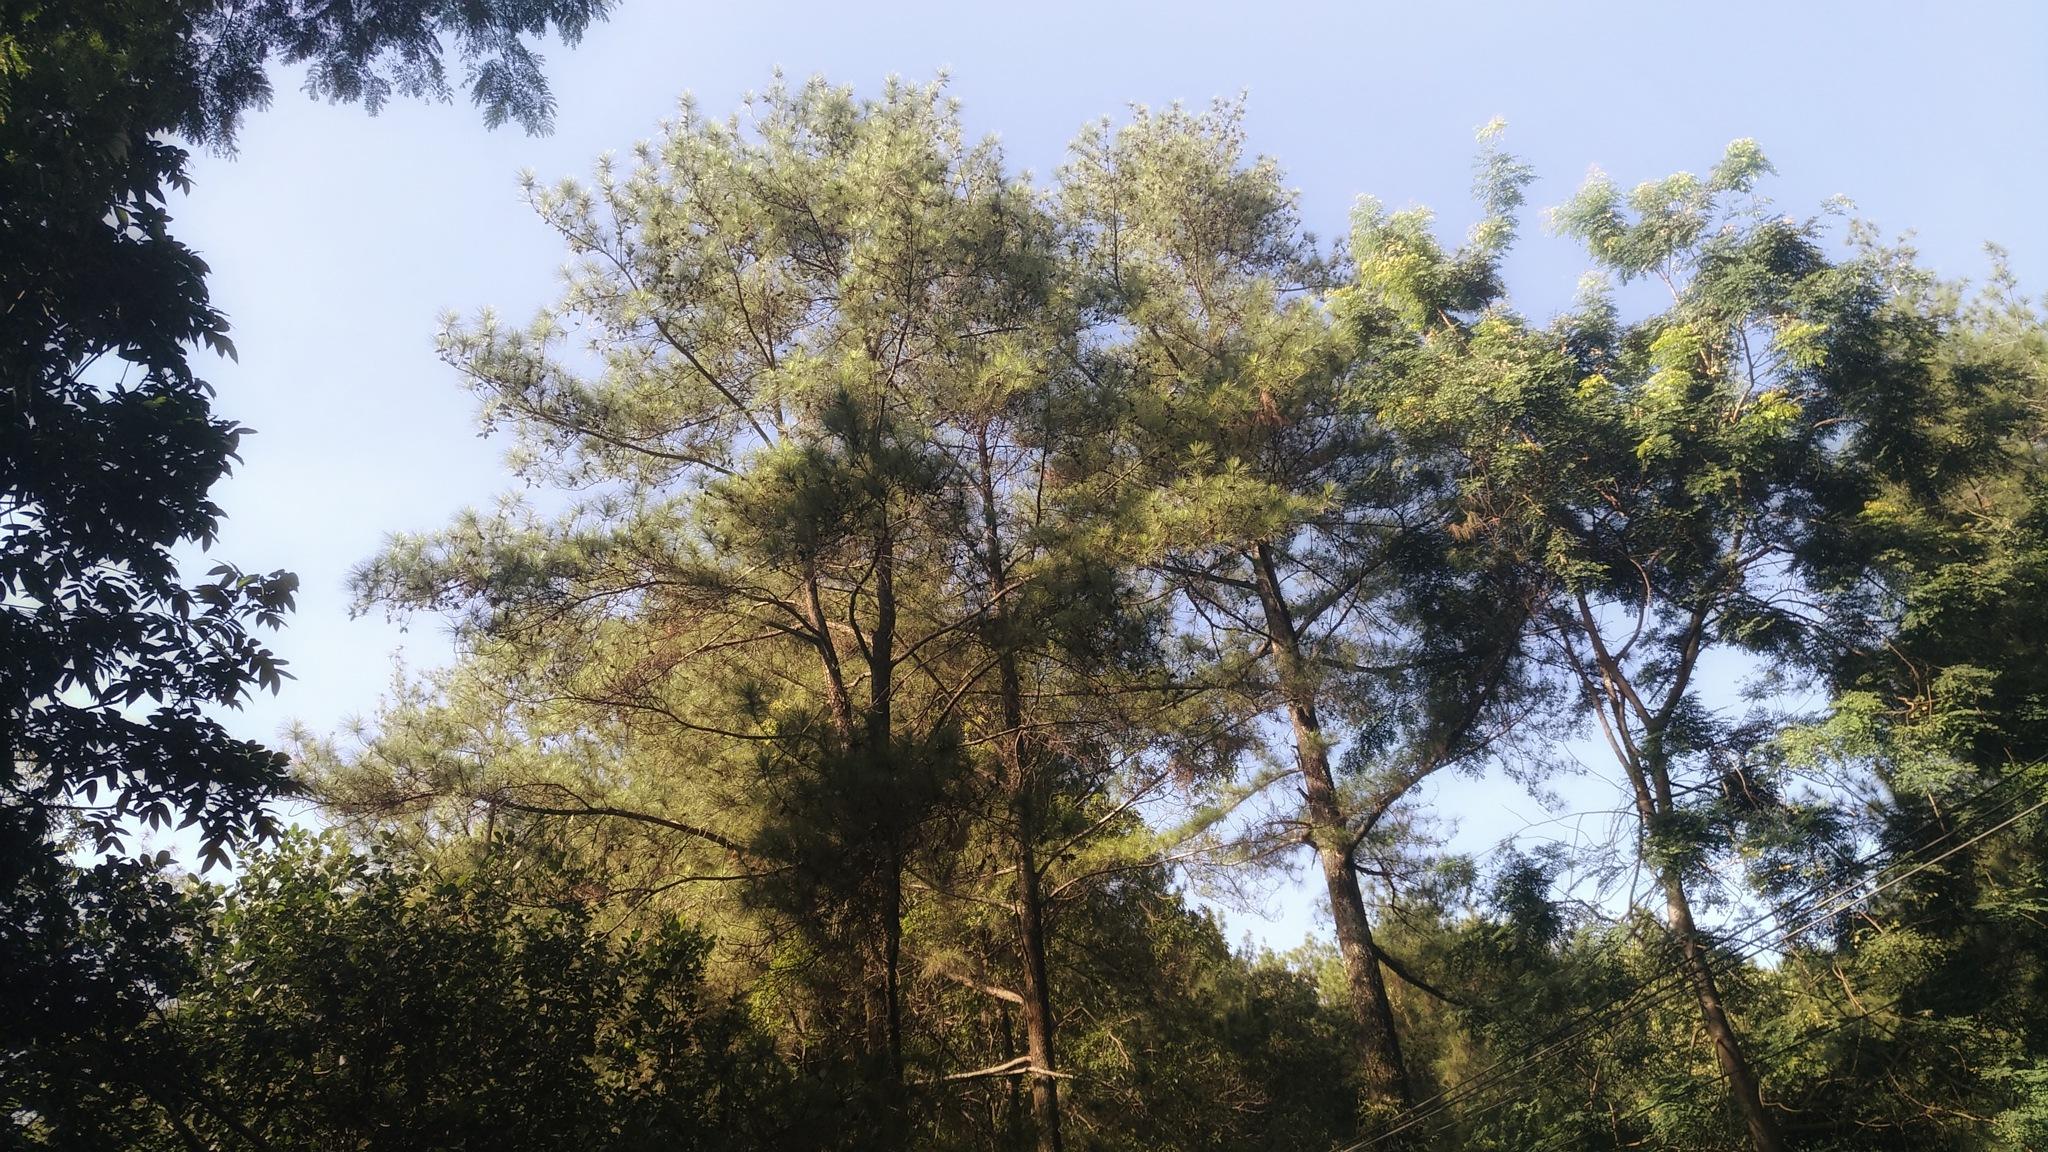 Pine Tree by Bavner Donaldo